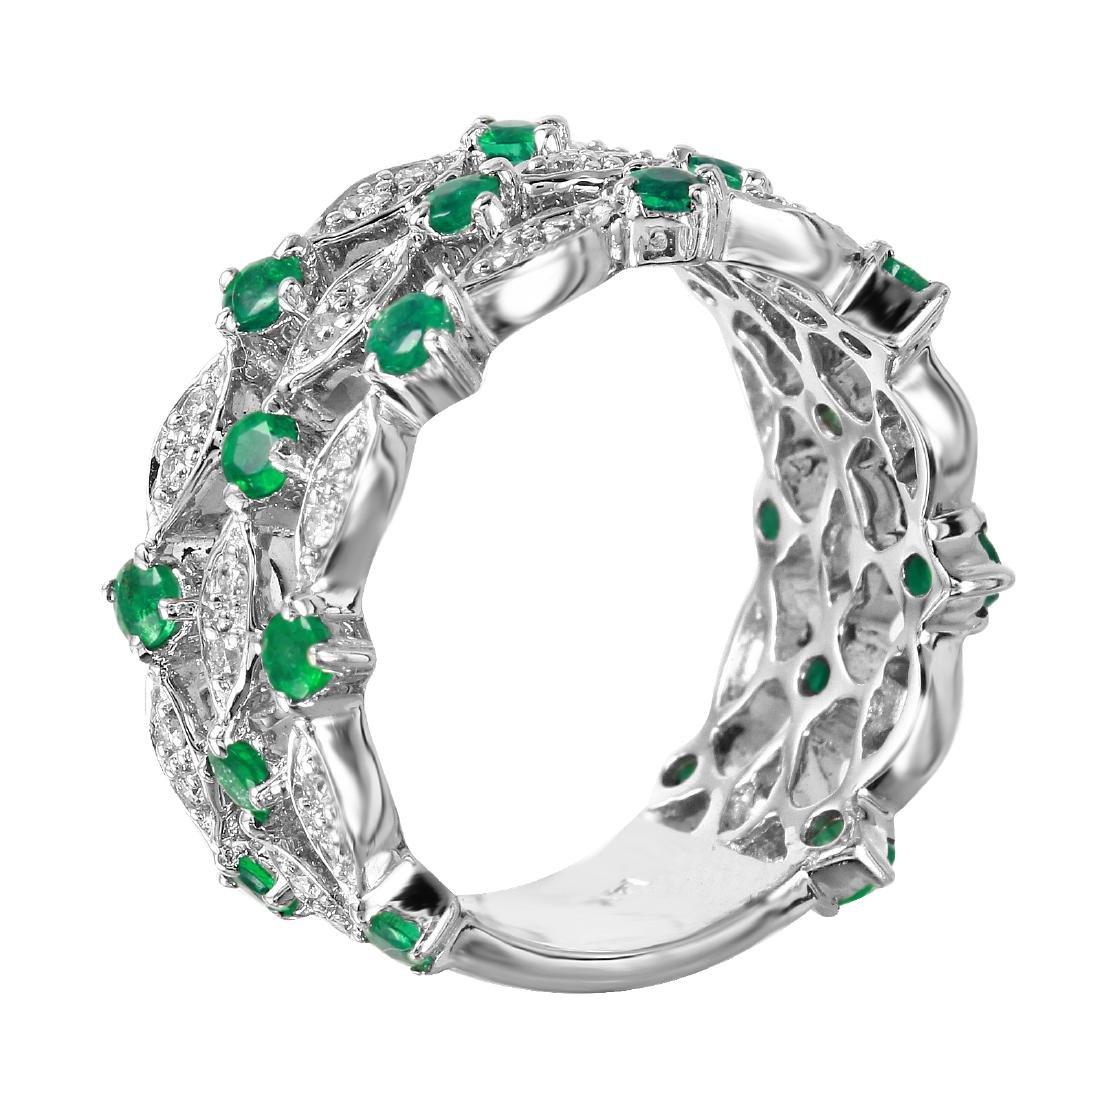 14KT White Gold 1.25ctw Emerald Diamond Ring Size 6.25 - 6